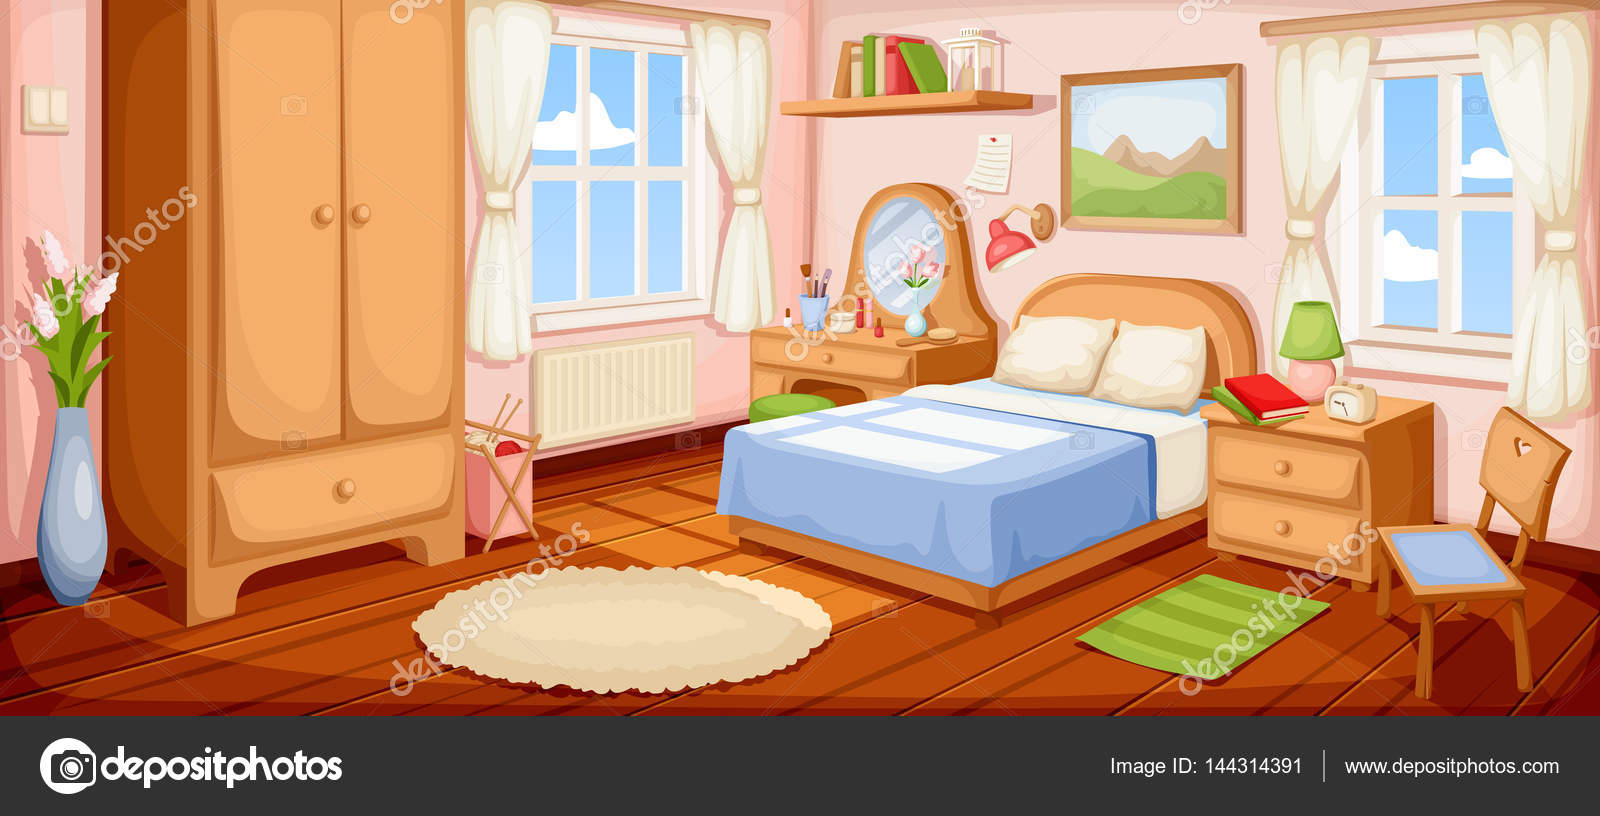 Bedroom Interior Vector Illustration Vector Image By C Naddya Vector Stock 144314391